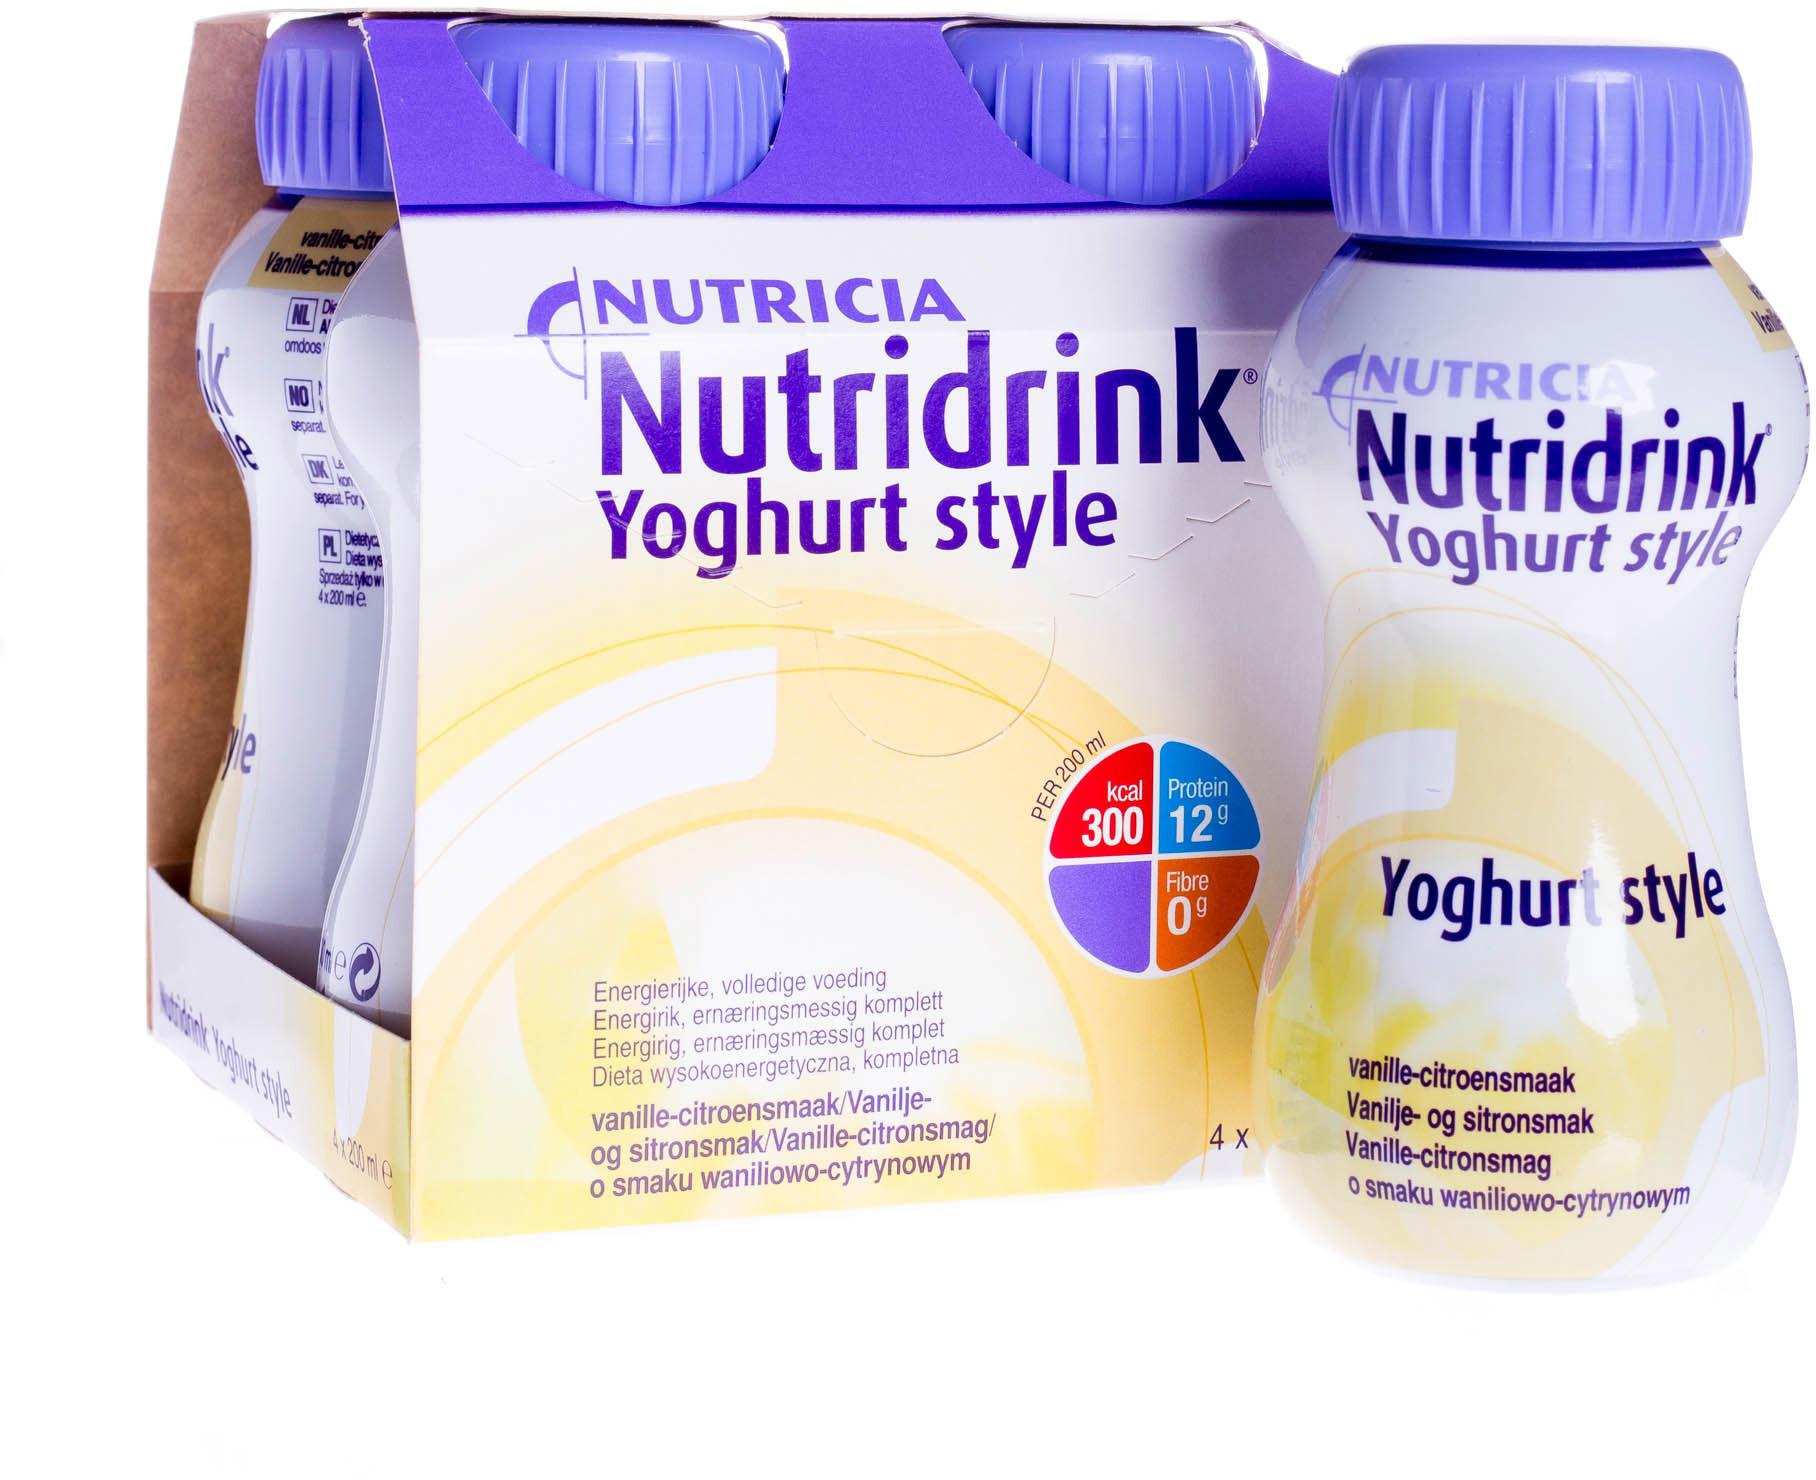 NUTRIDRINK Yoghurt Style smak waniliowo-cytrynowy 4 x 200 ml